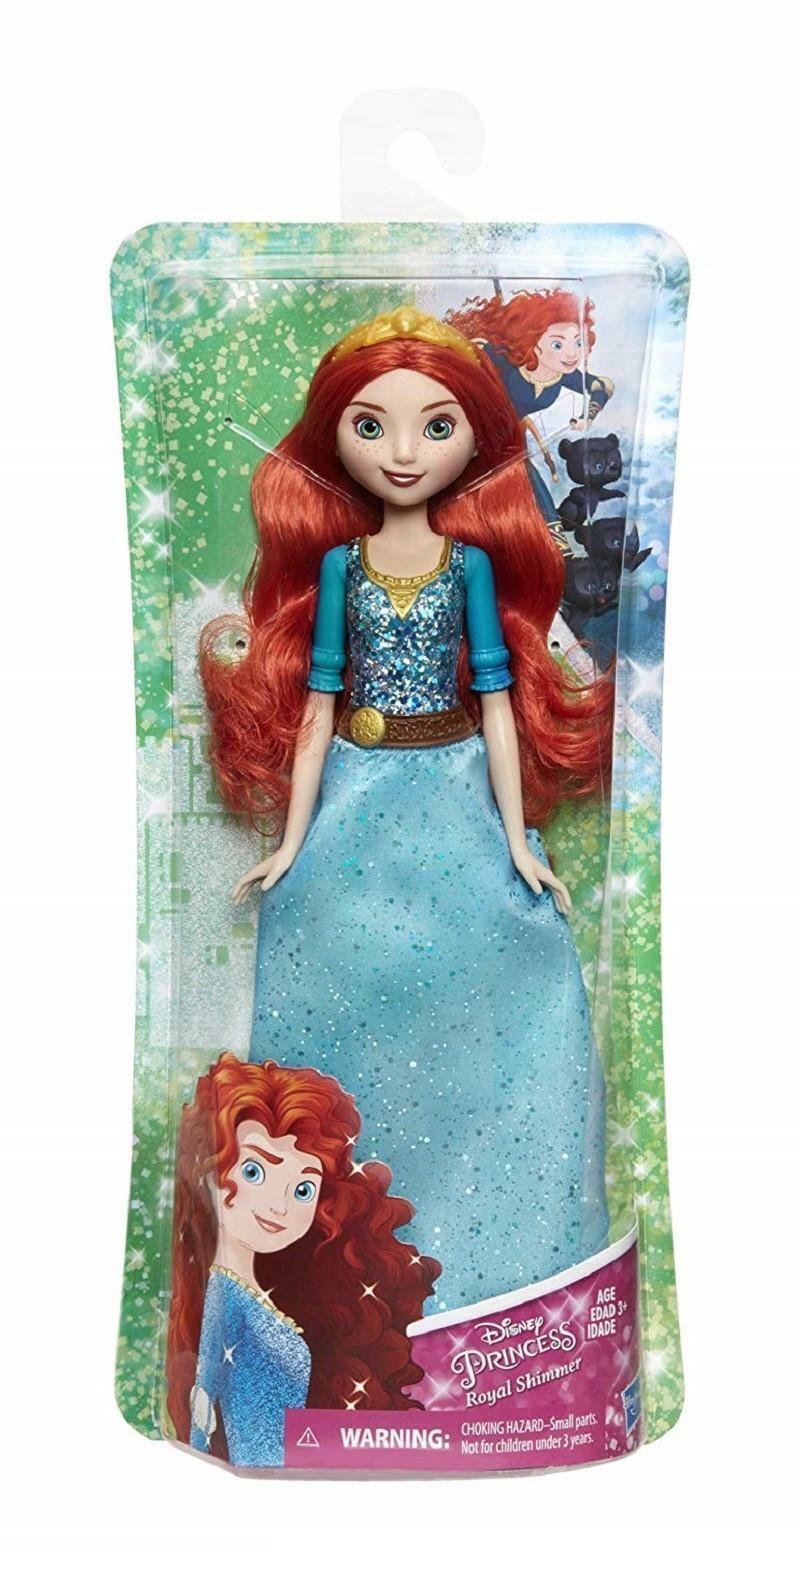 hasbro disney princess - royal shimmer fashion doll 30 cm